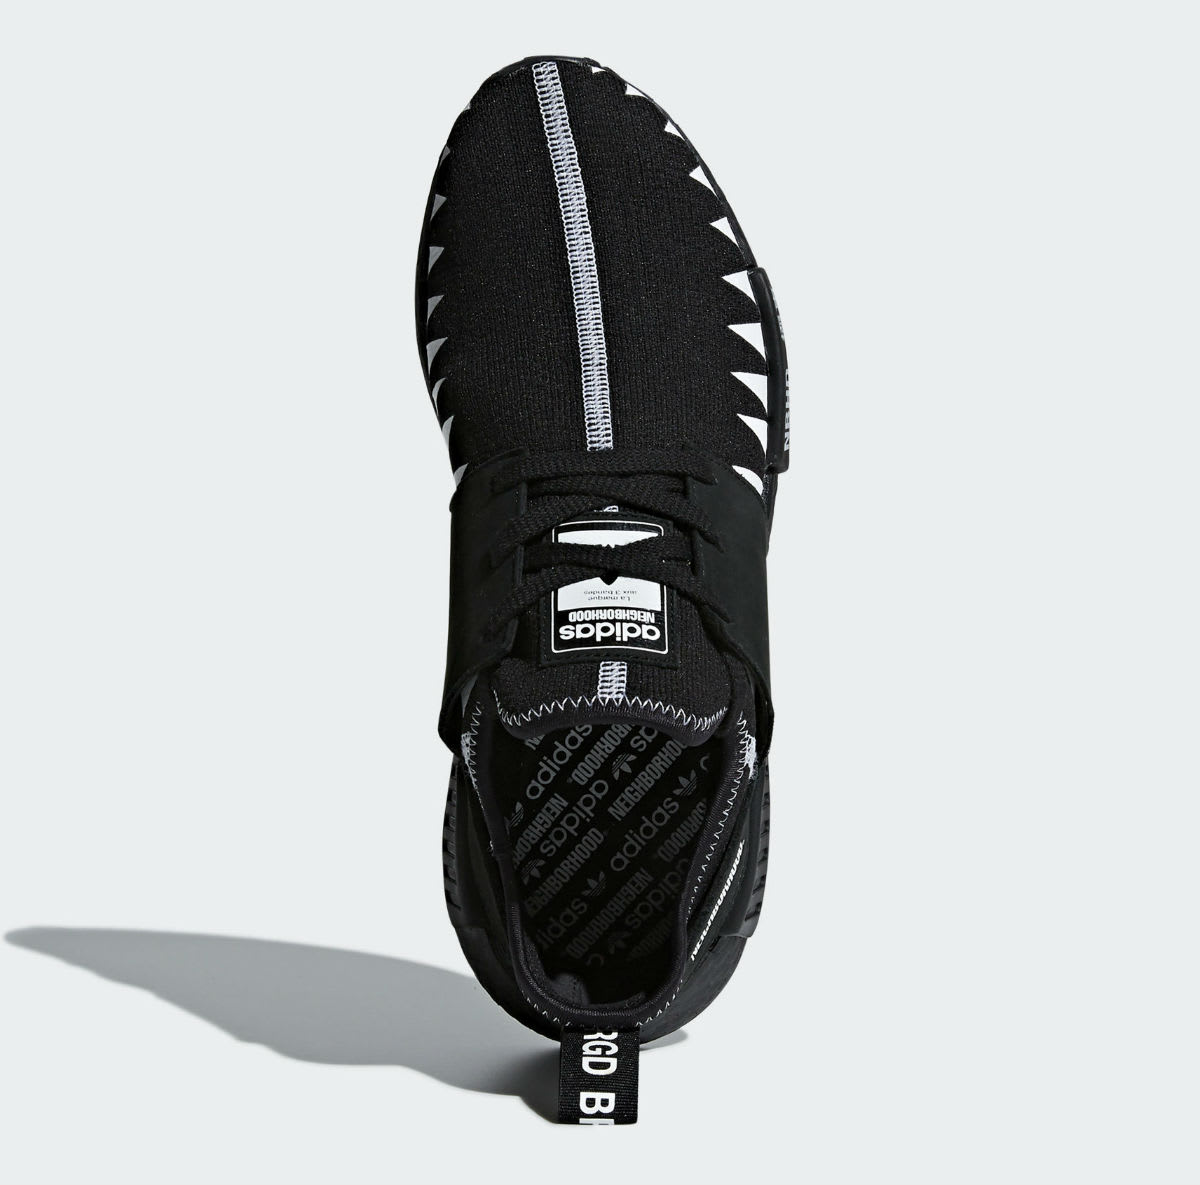 Neighborhood x Adidas NMD R1 Release Date DA8835 Top